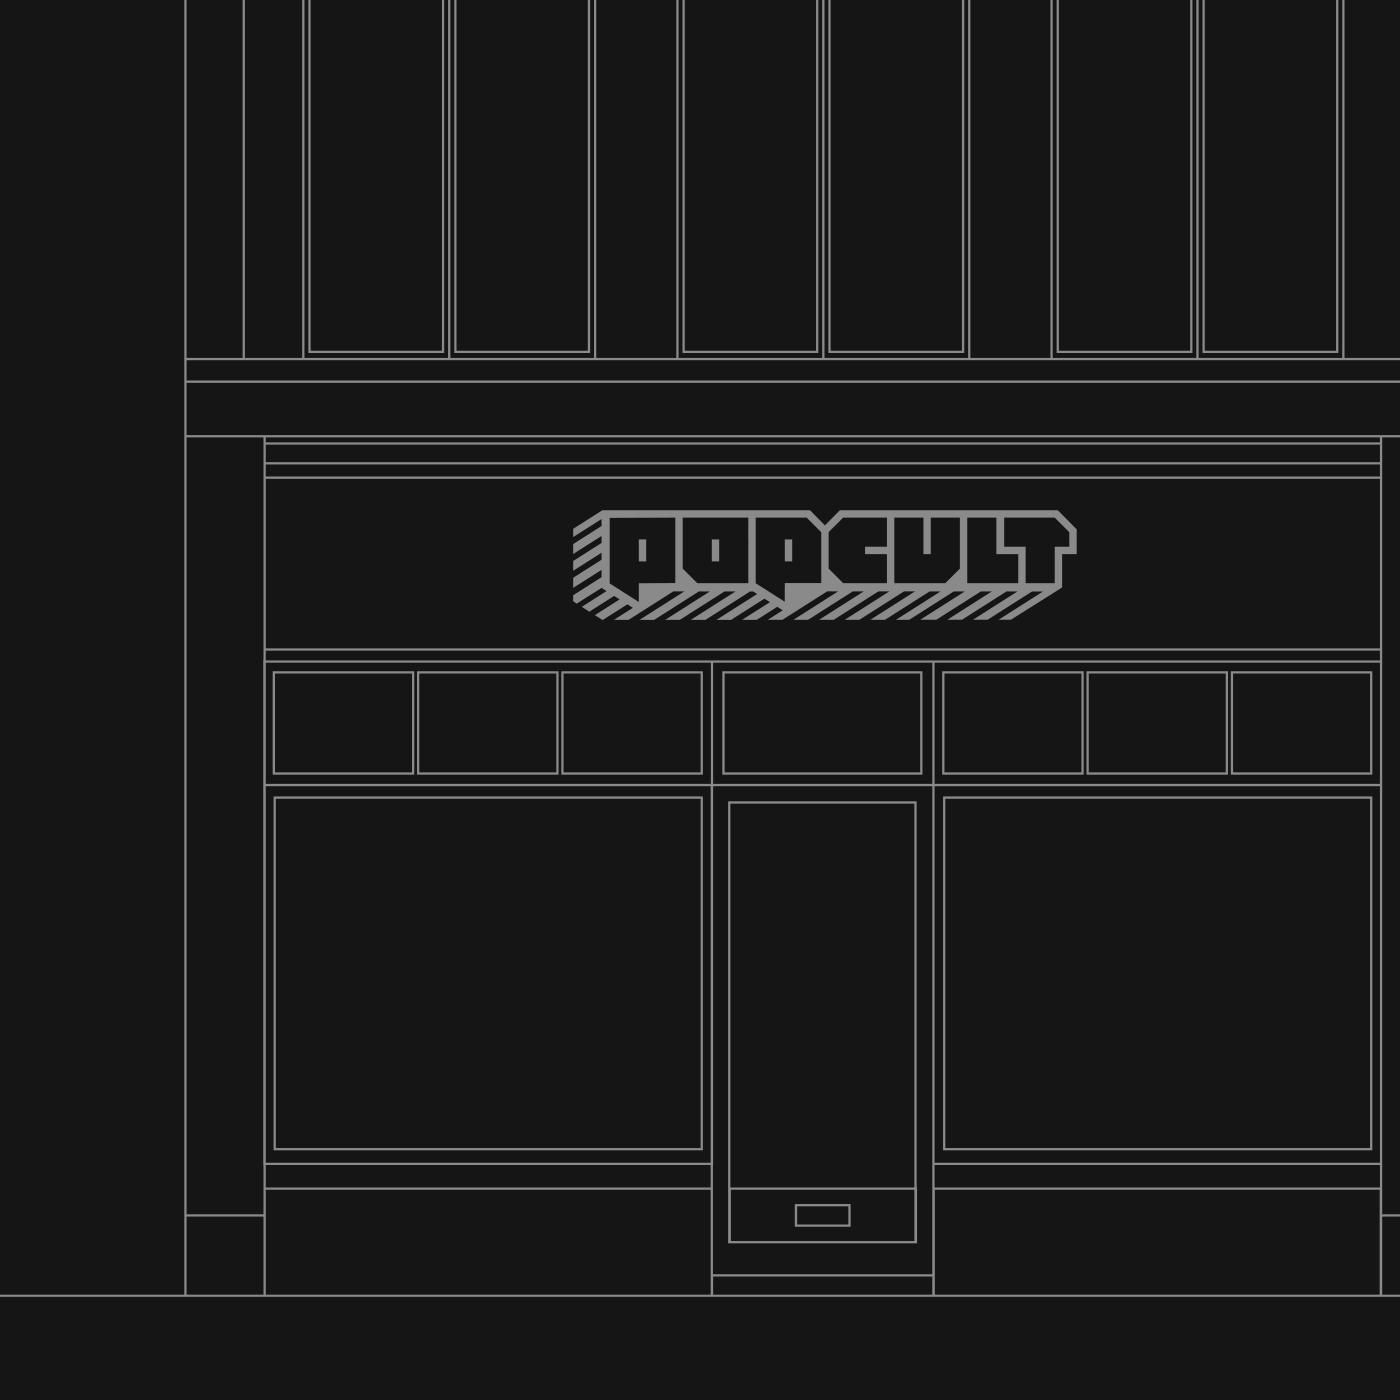 Popcult_03